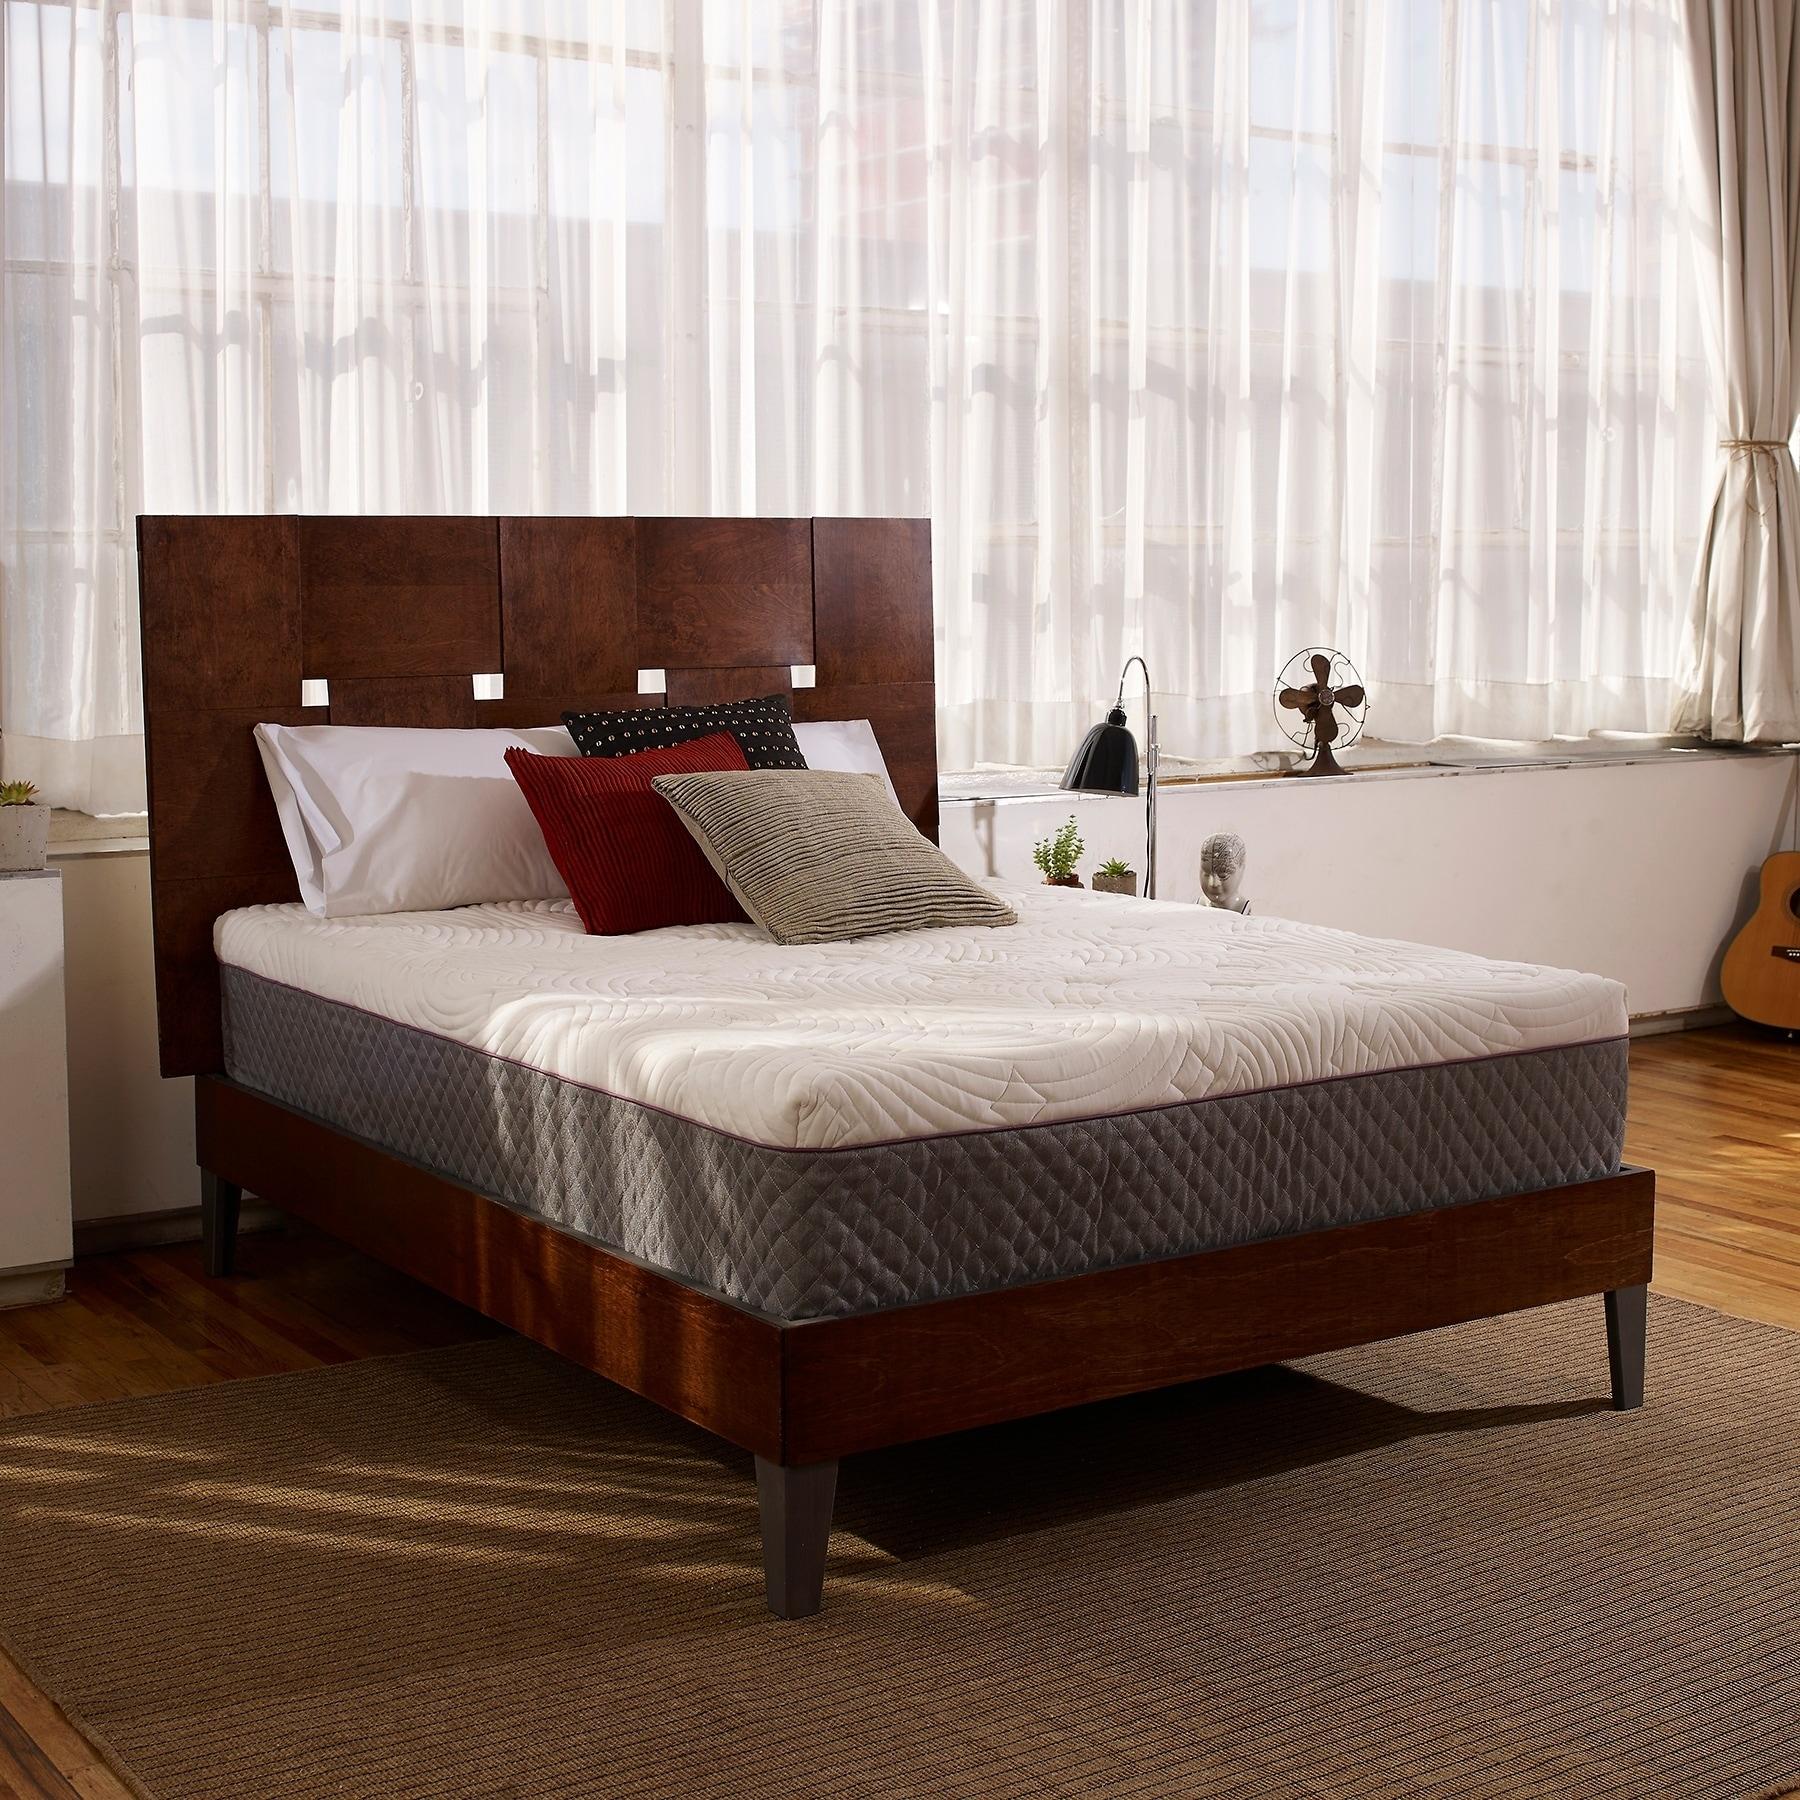 shop dreamaway gramercy 12-inch memory foam mattress - queen - on